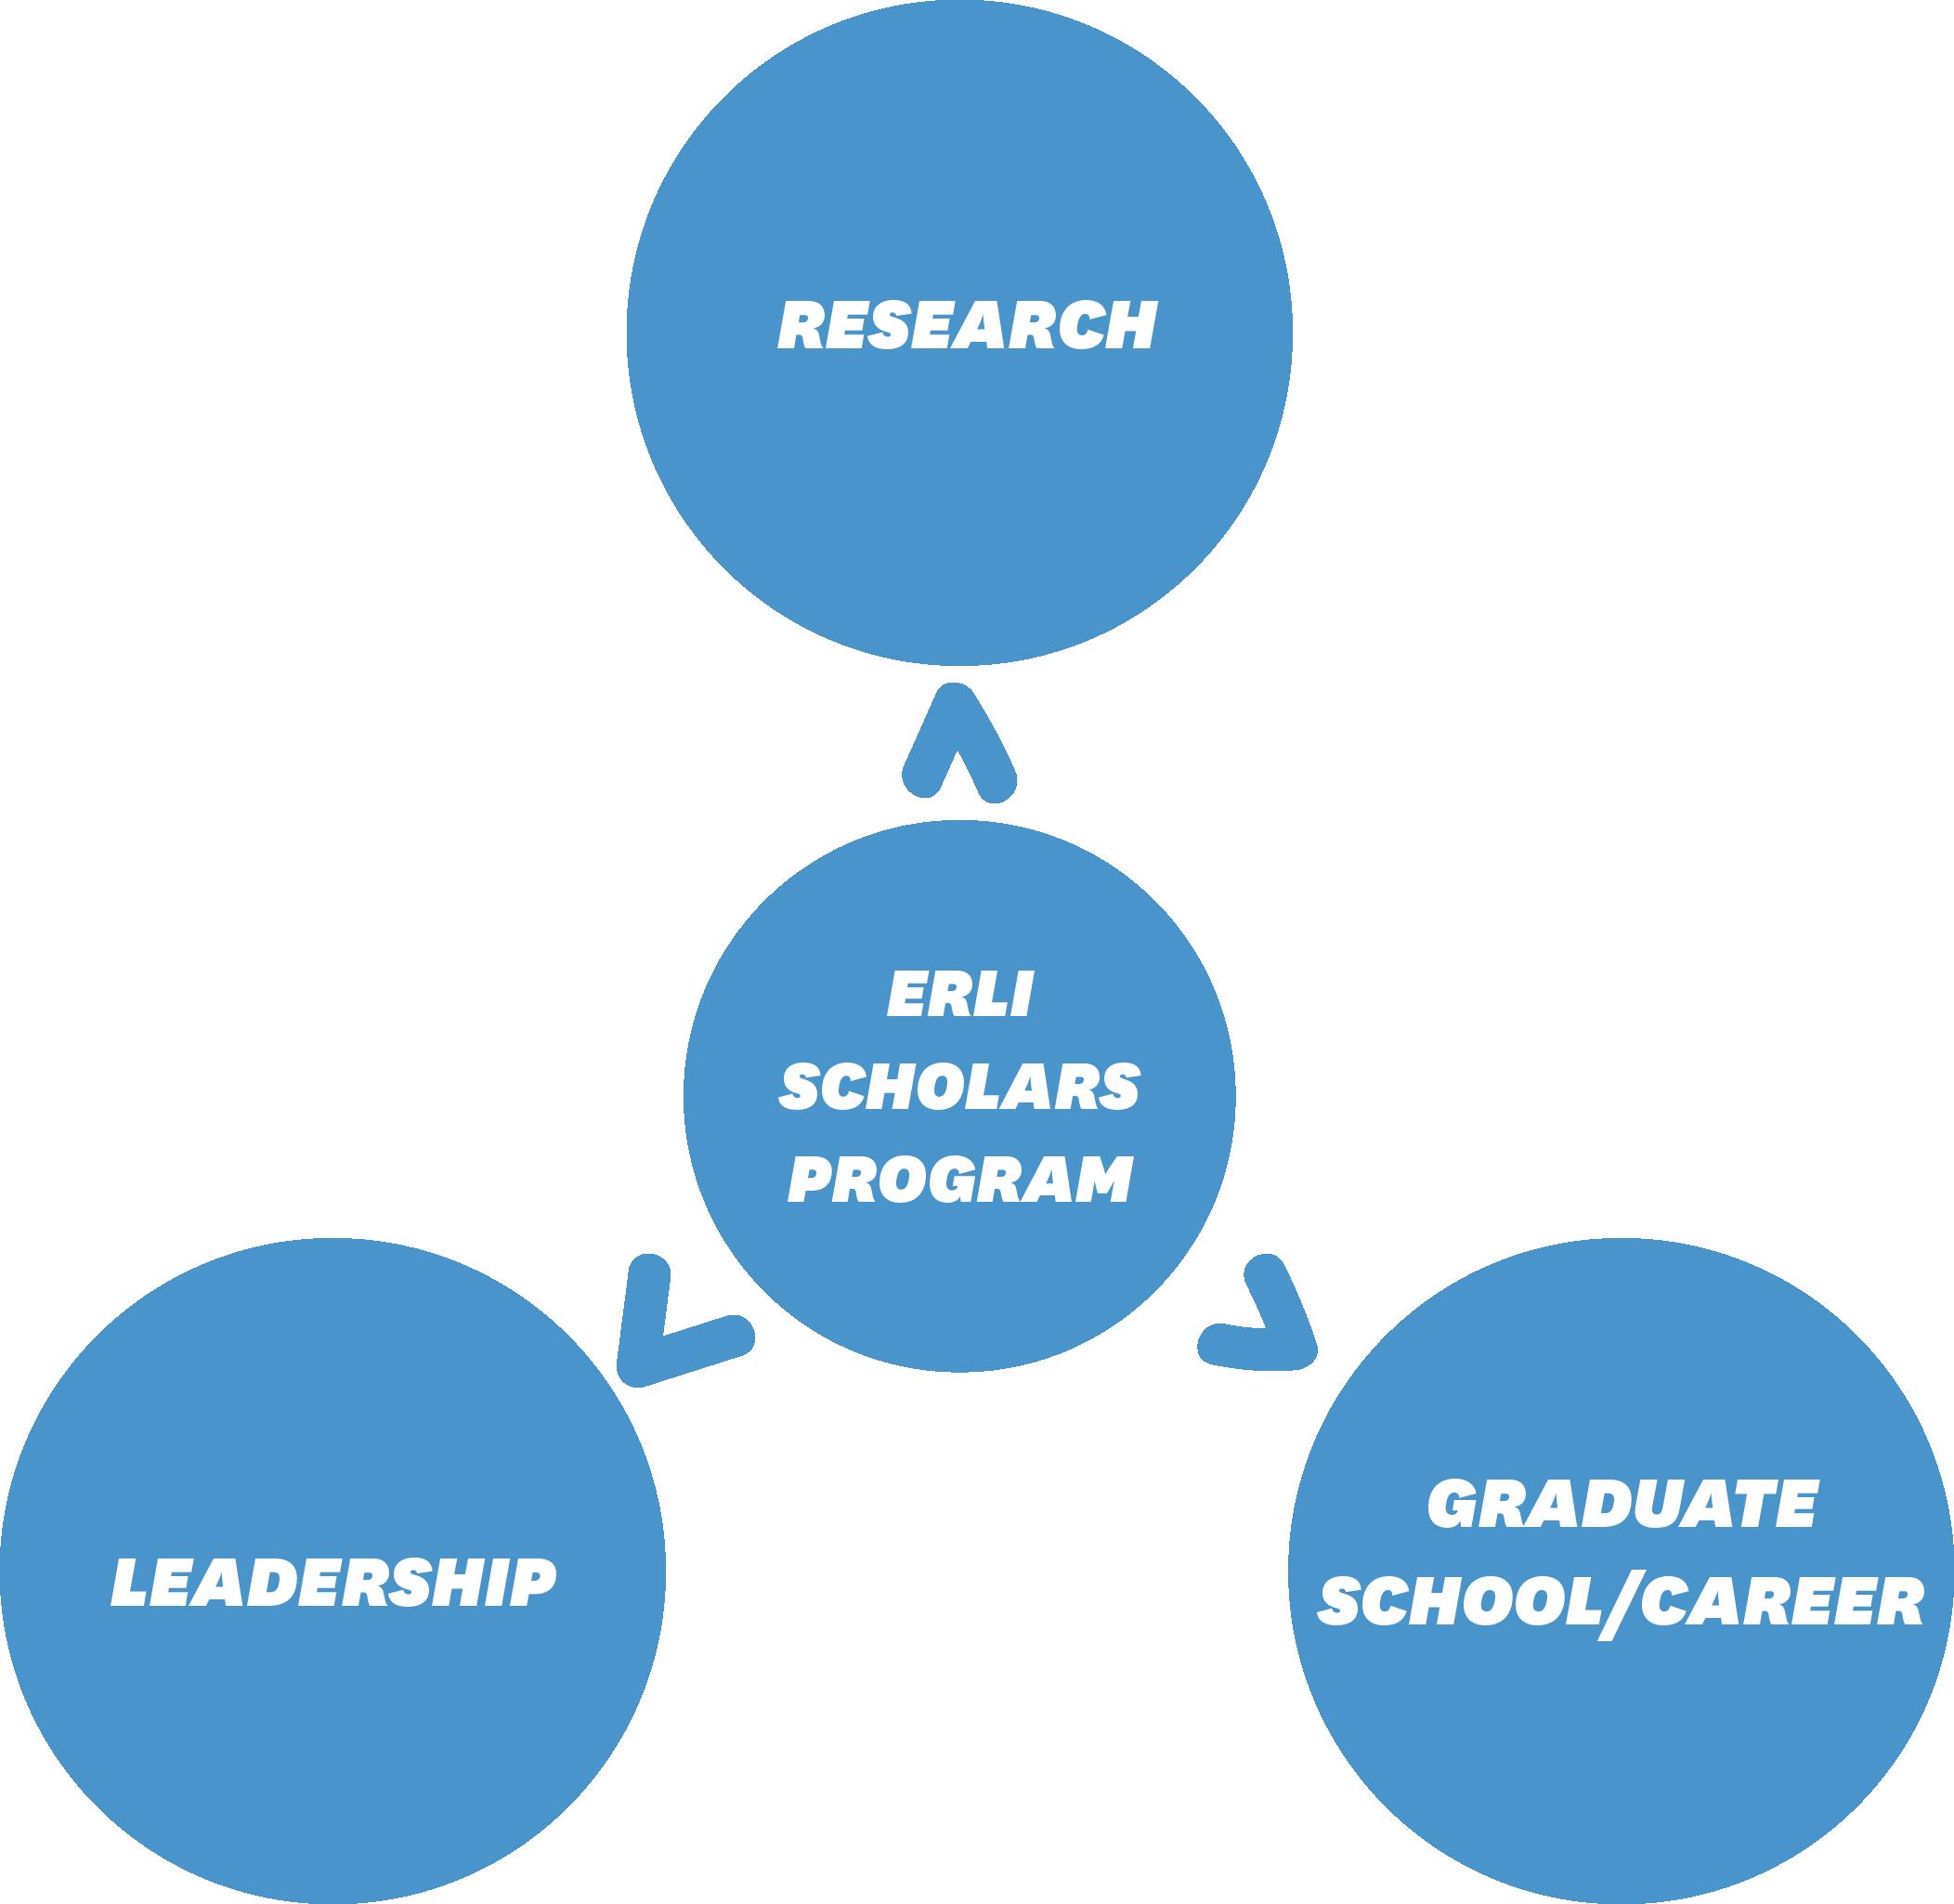 ERLI Scholars Program Diagram